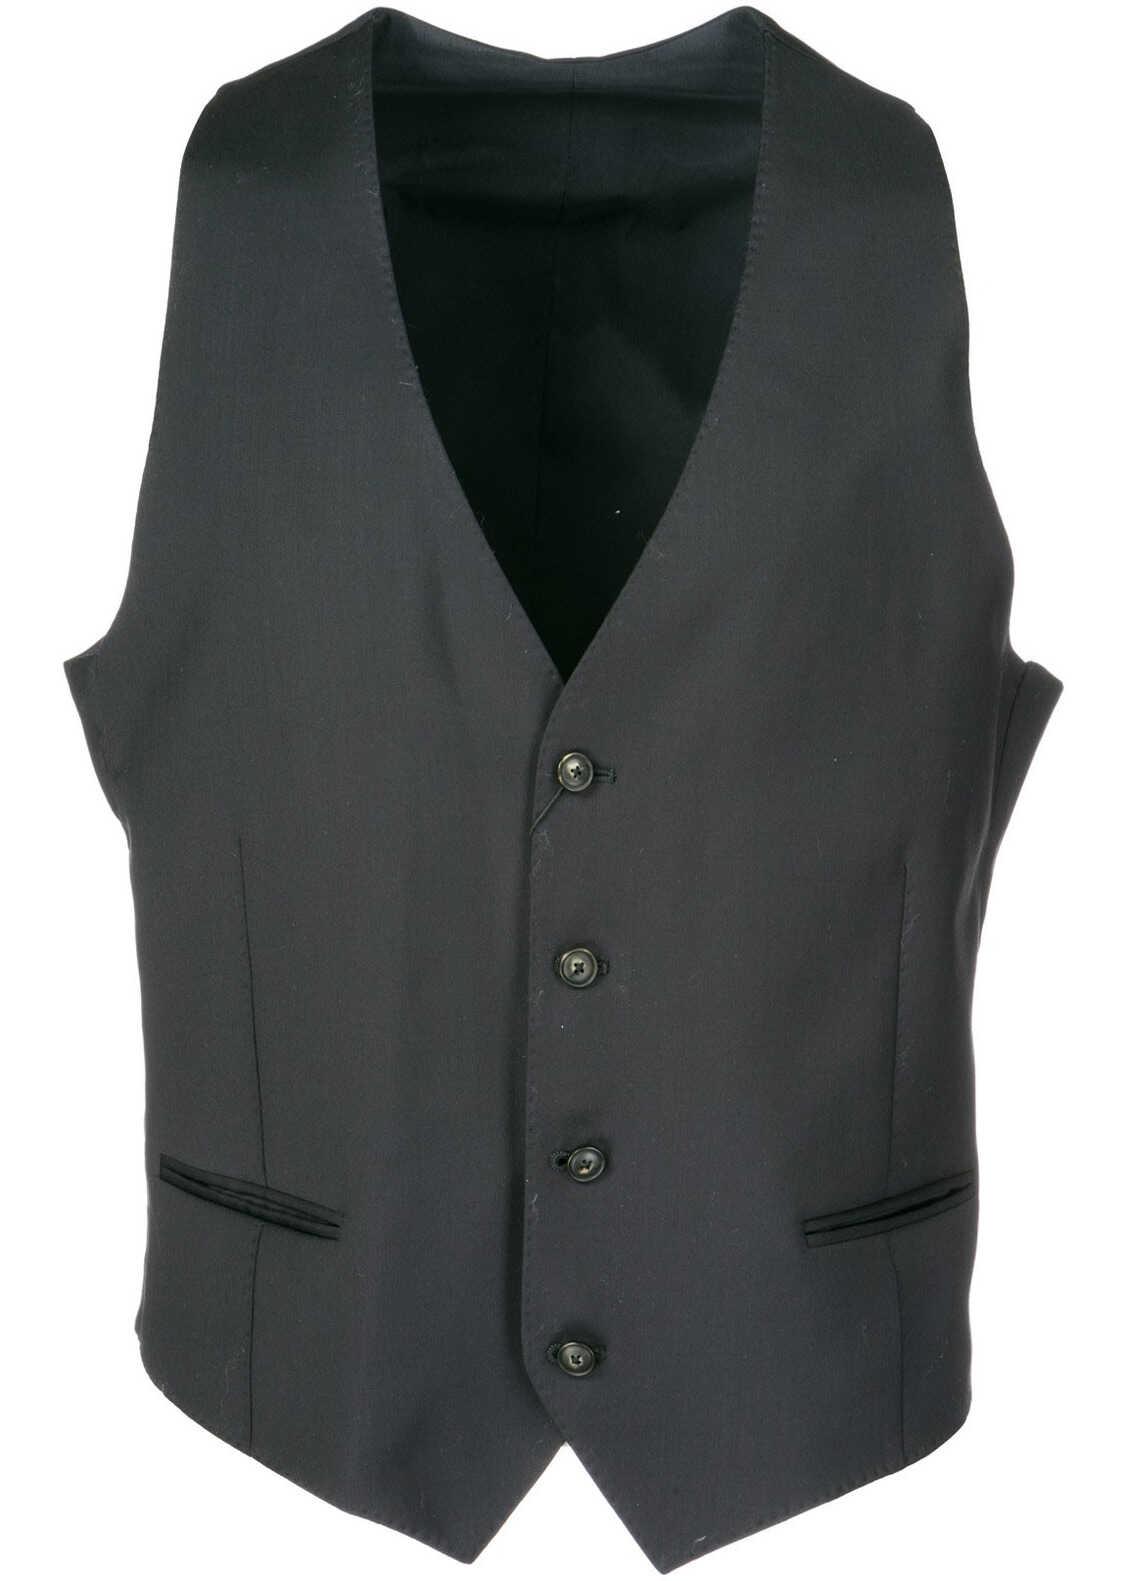 Emporio Armani Waistcoat Vest Black